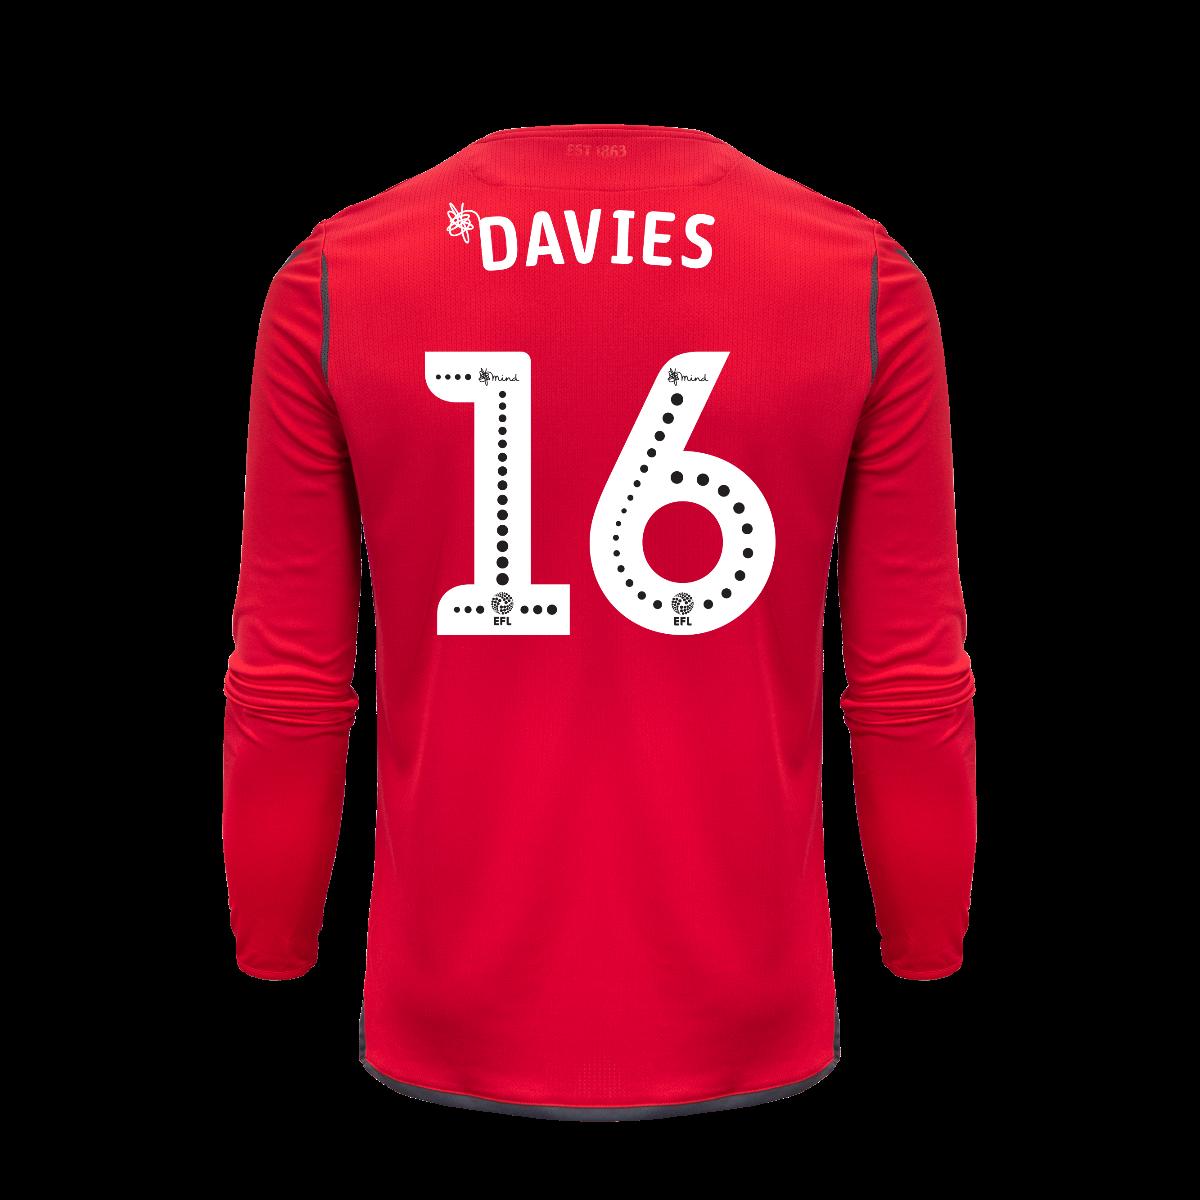 2019/20 Junior Away GK Shirt - Davies